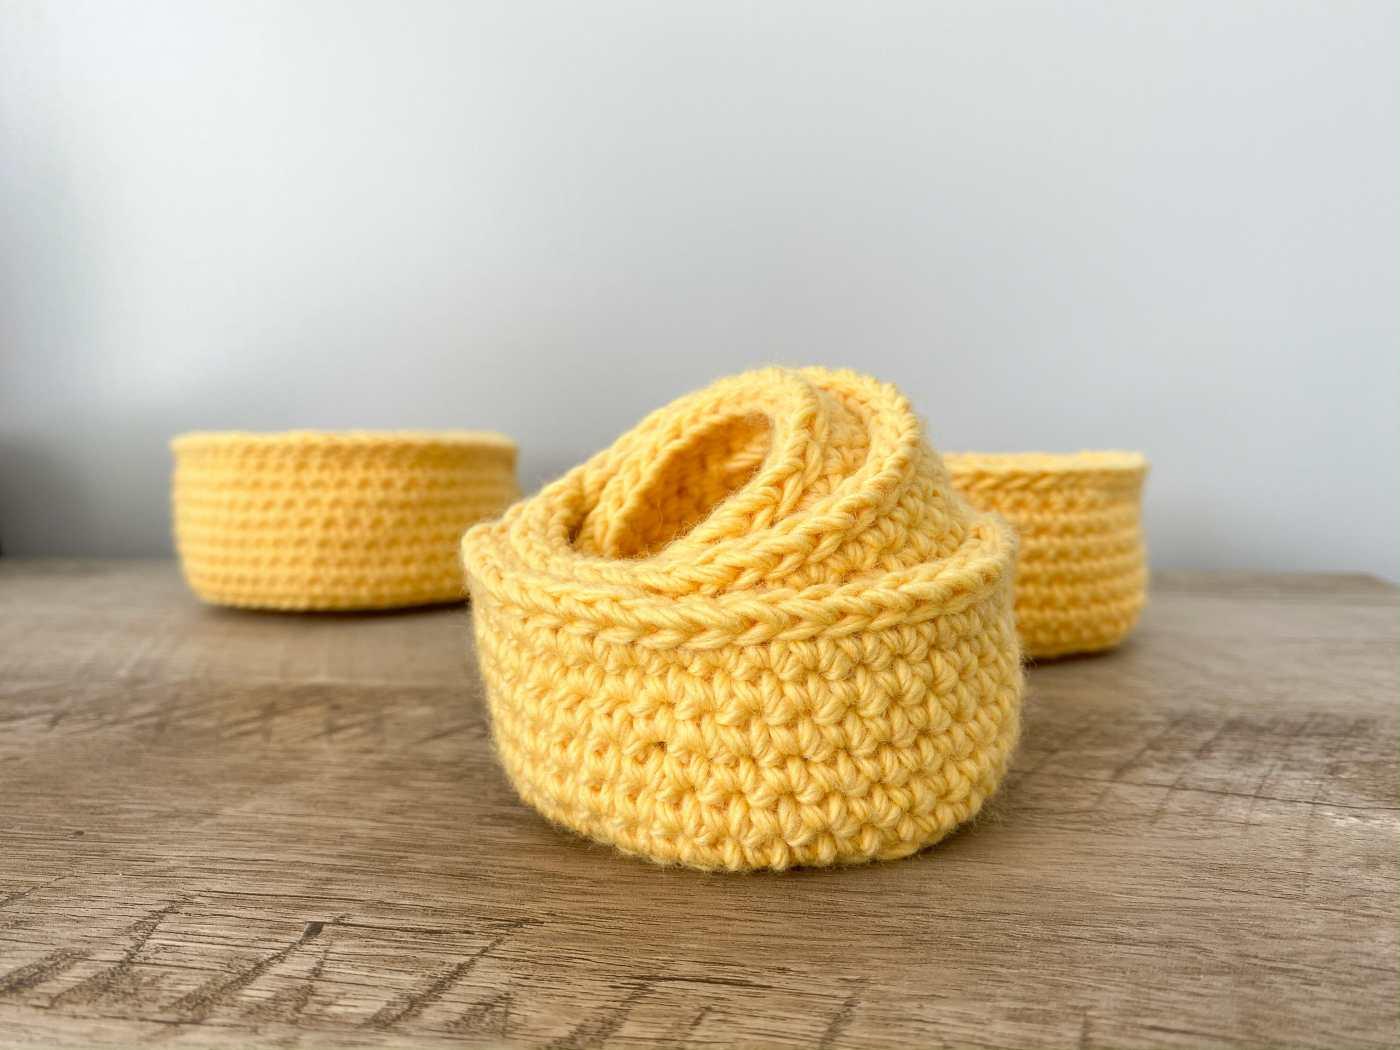 How To Crochet Mini Nesting Baskets